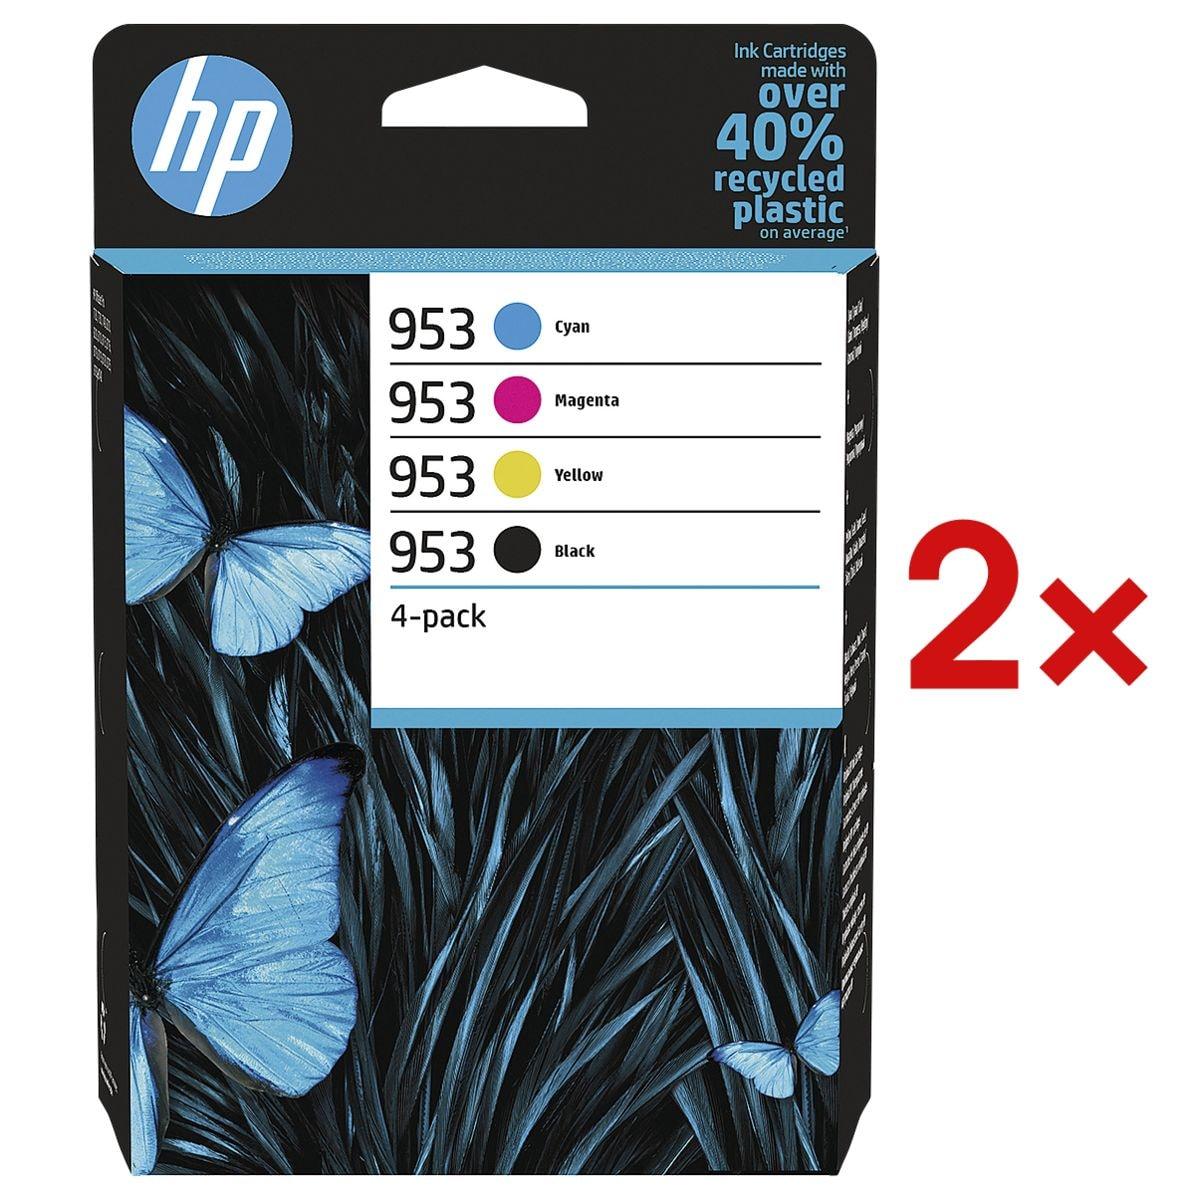 HP 2x Lot de cartouches jet d'encre HP 953 CMYK Multipack, cyan, magenta, jaune, noir - 6ZC69AE